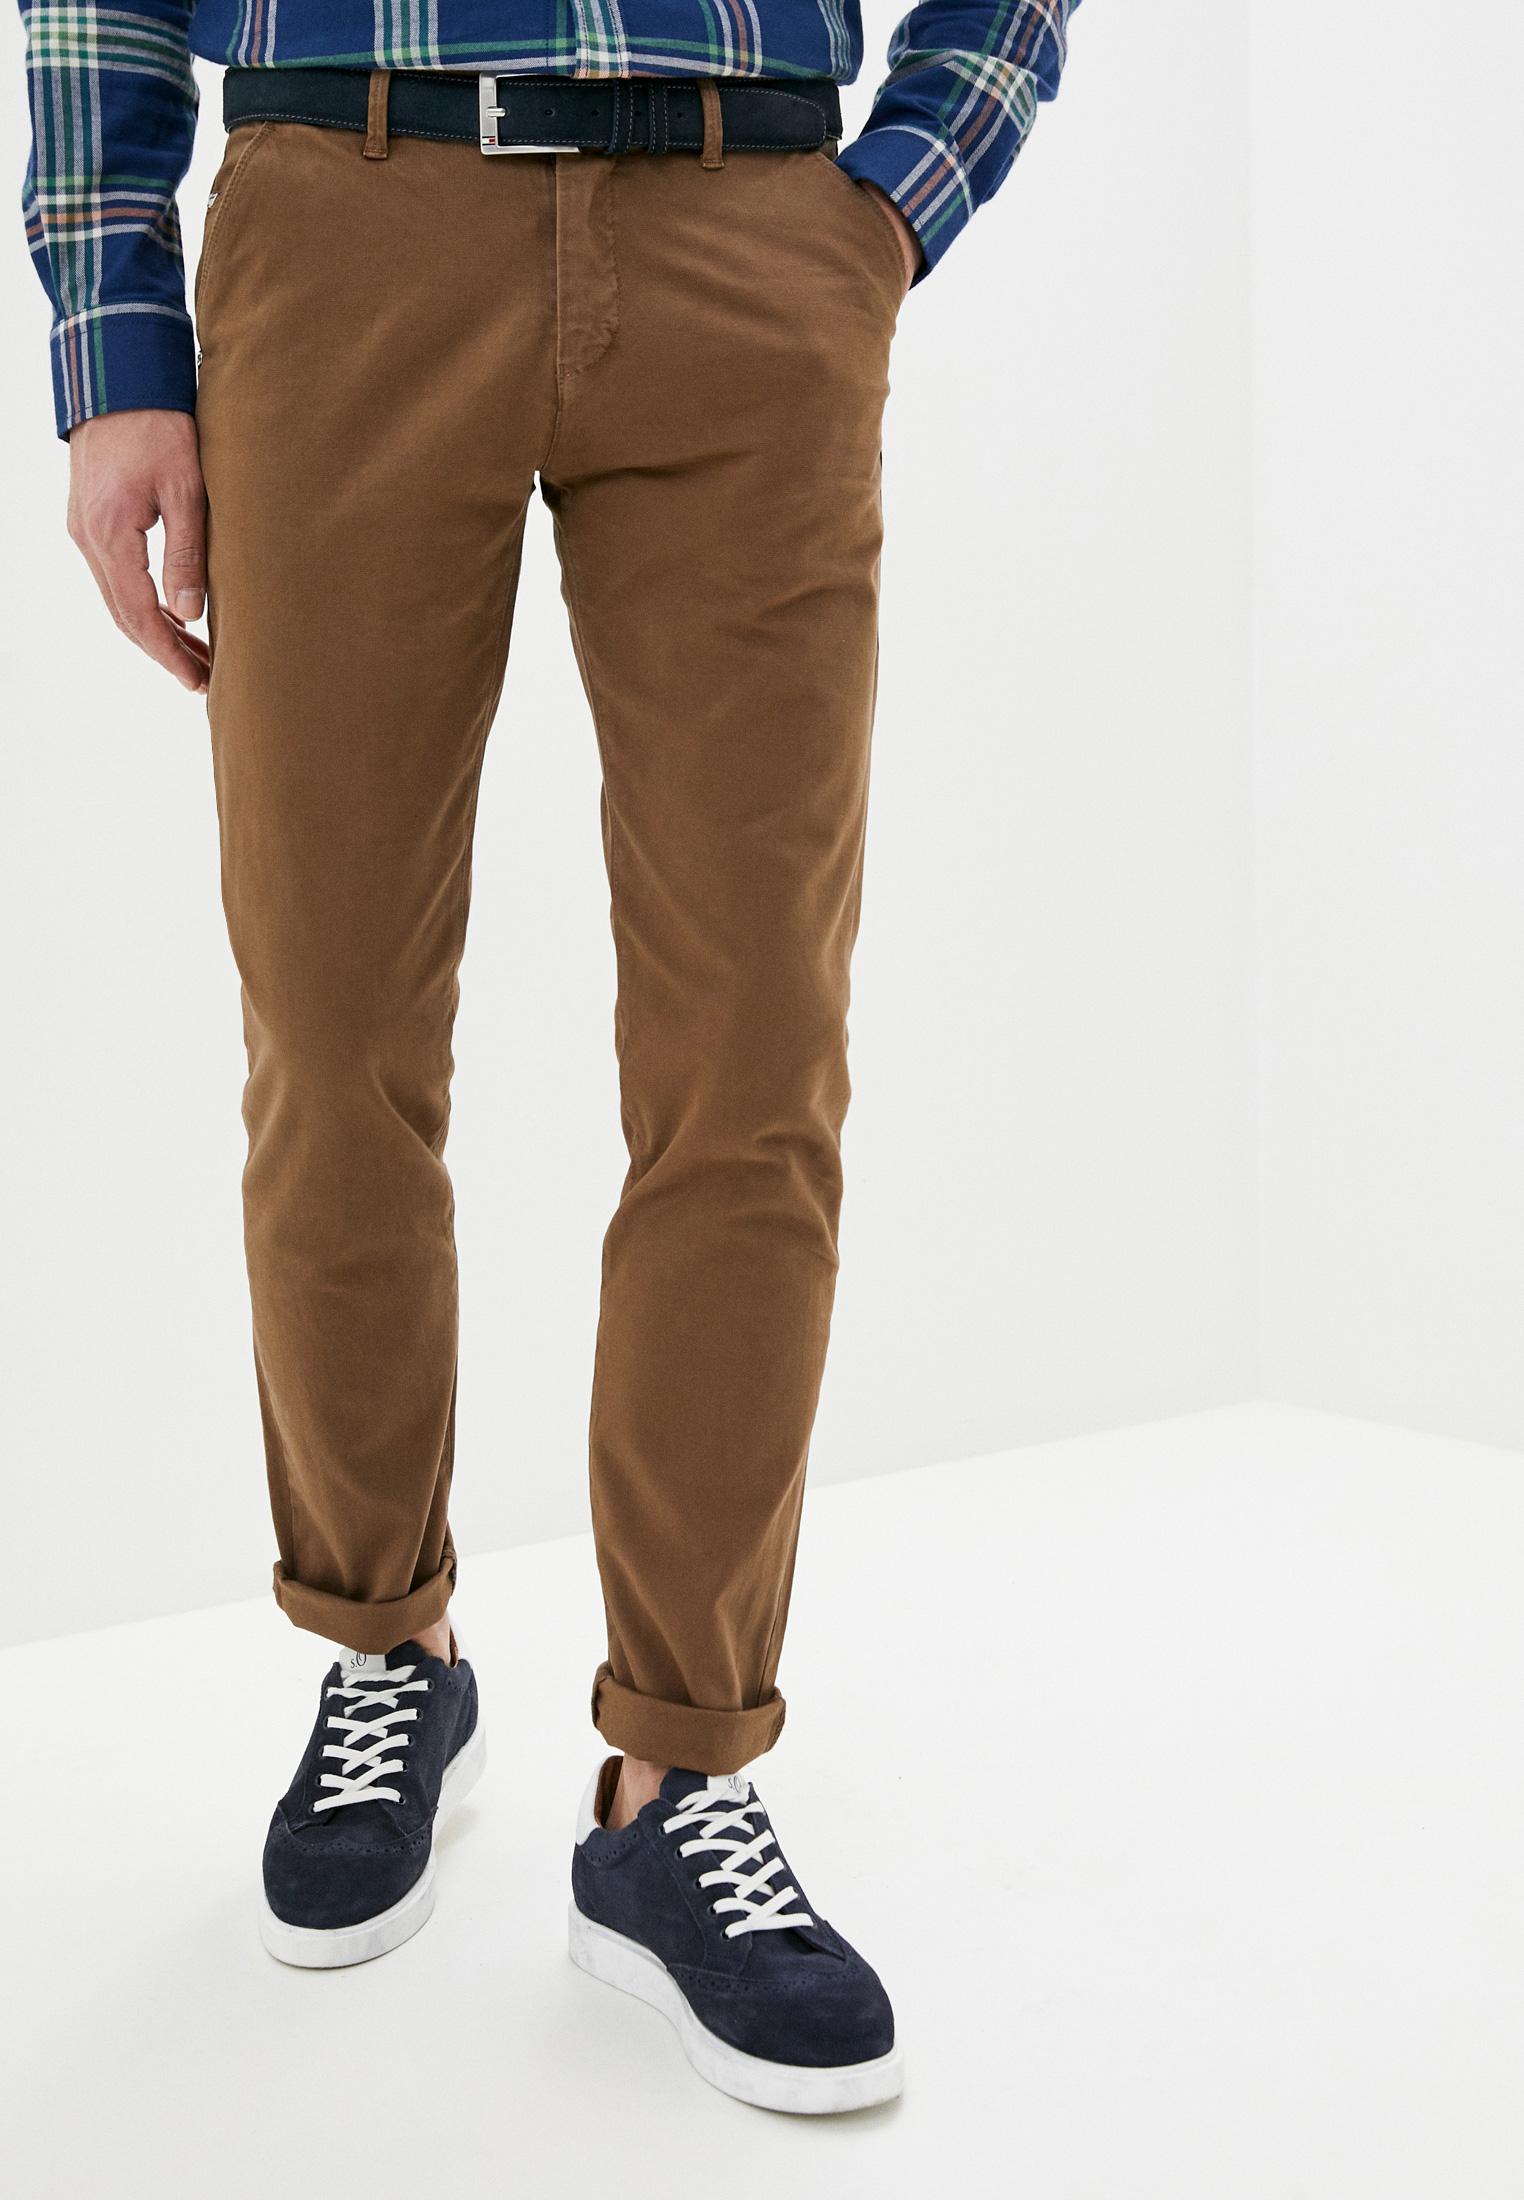 Мужские повседневные брюки JIMMY SANDERS (Джимми Сандерс) 19W PM11000 VISON